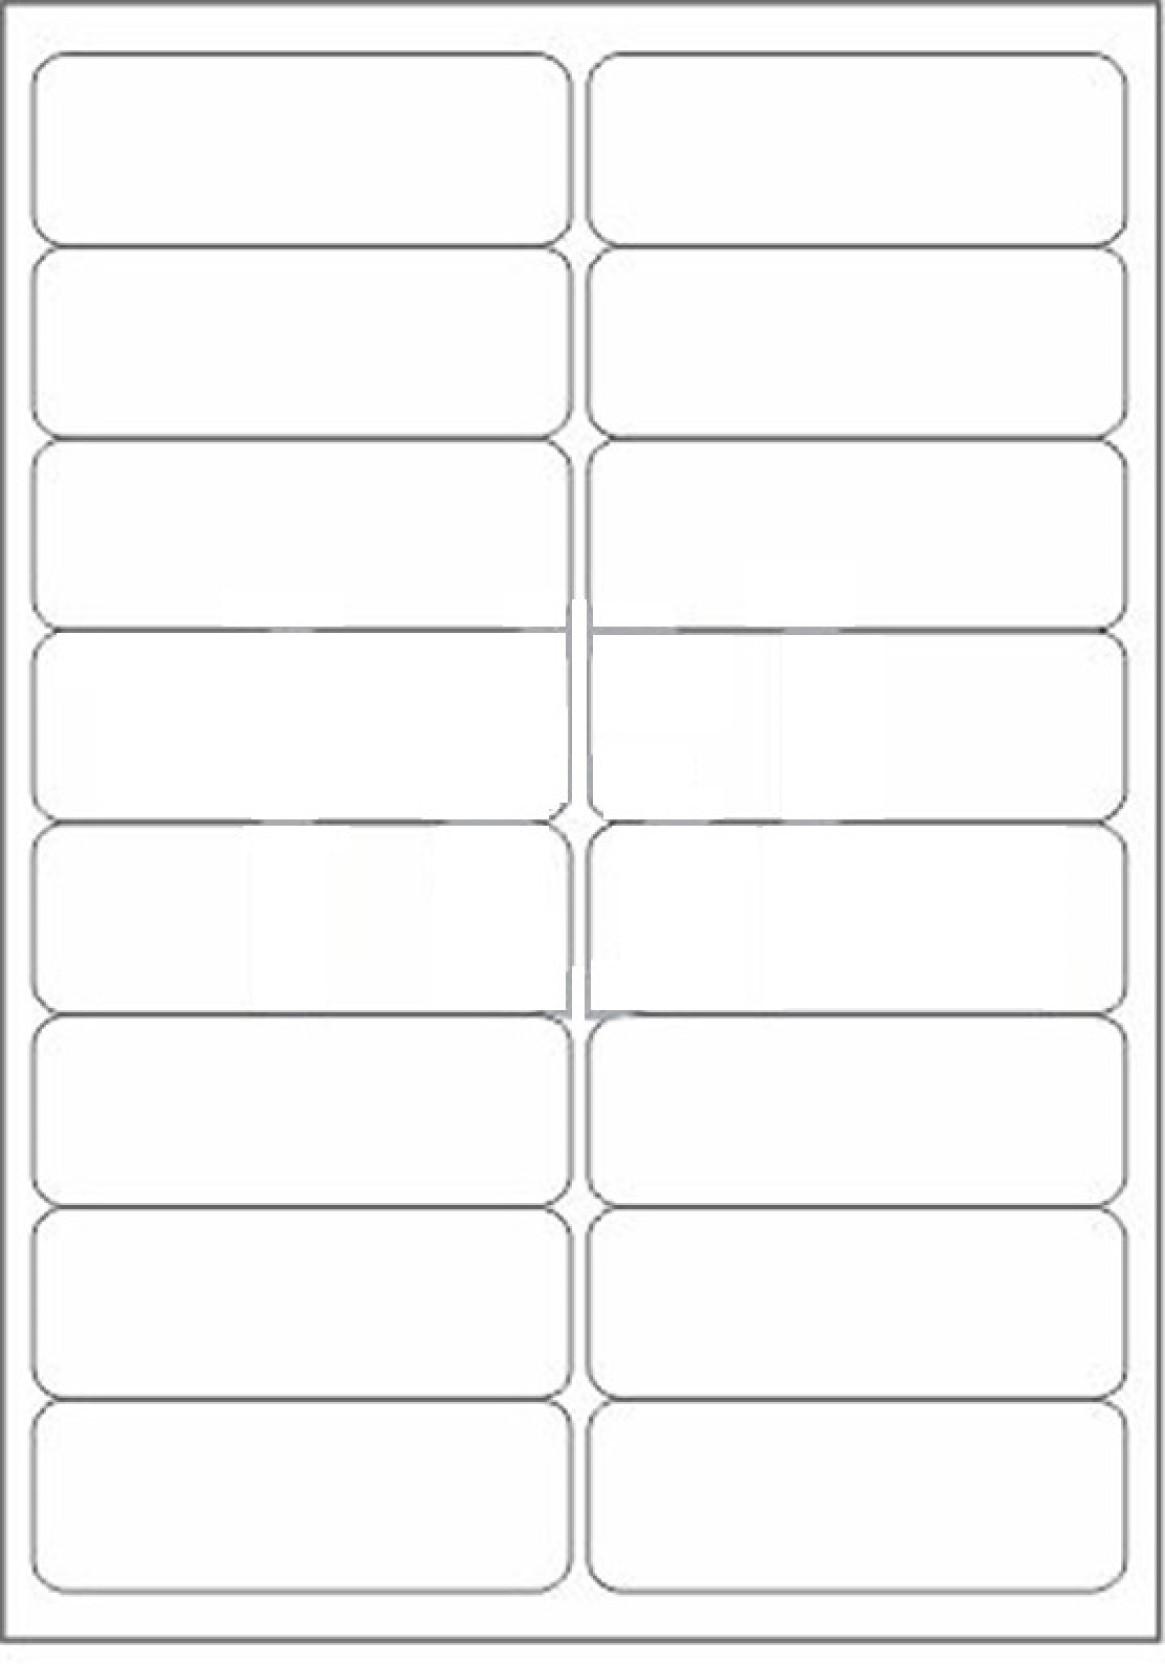 Novajet 16 A4 Size Sticker Paper Self Adhesive Paper Label